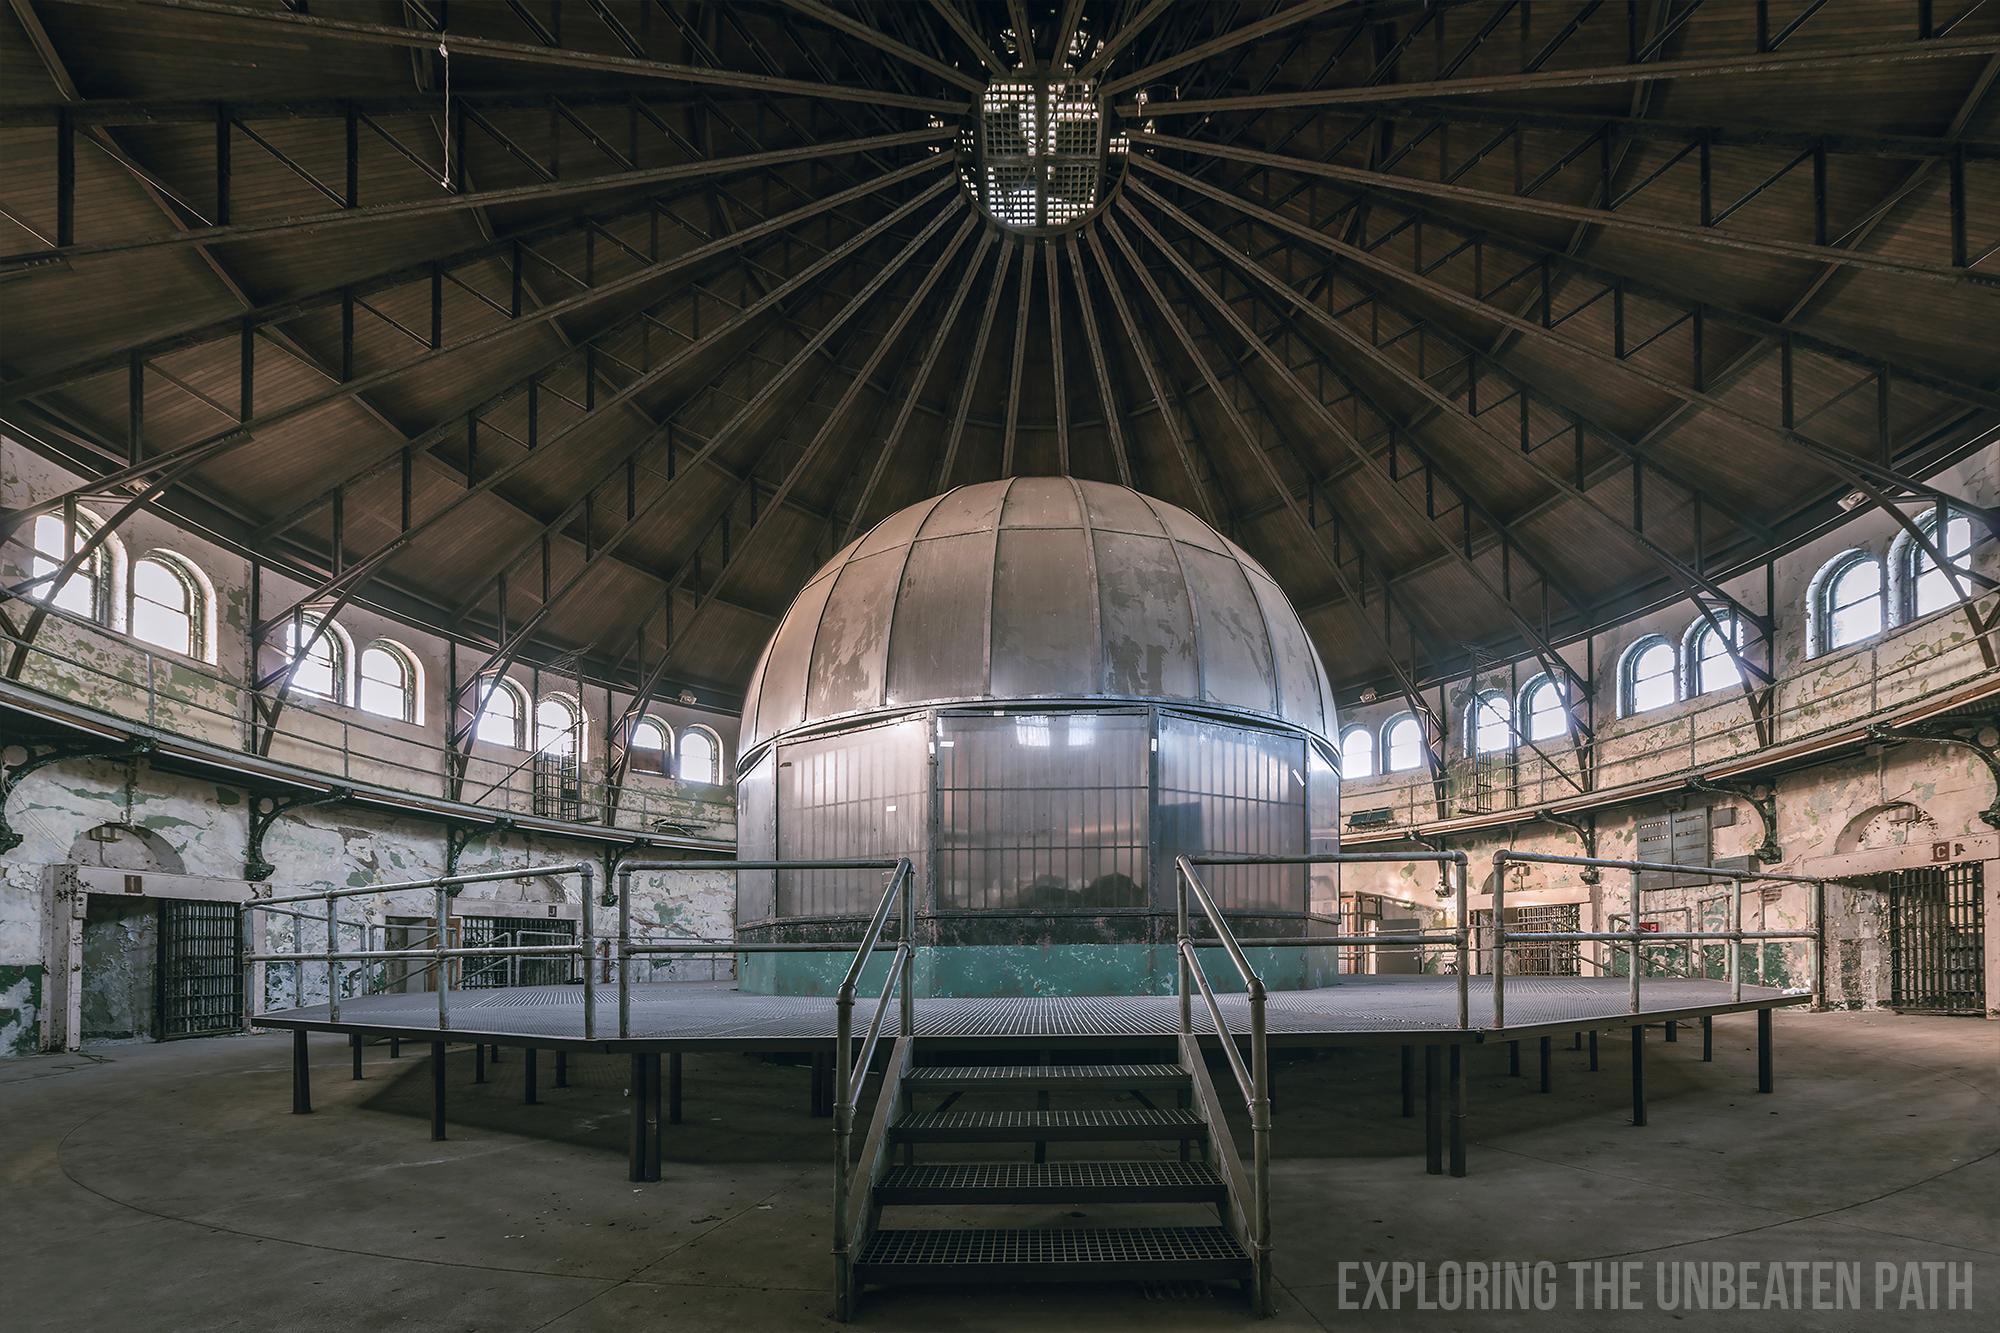 Holmesburg prison abandoned urbex urban exploring